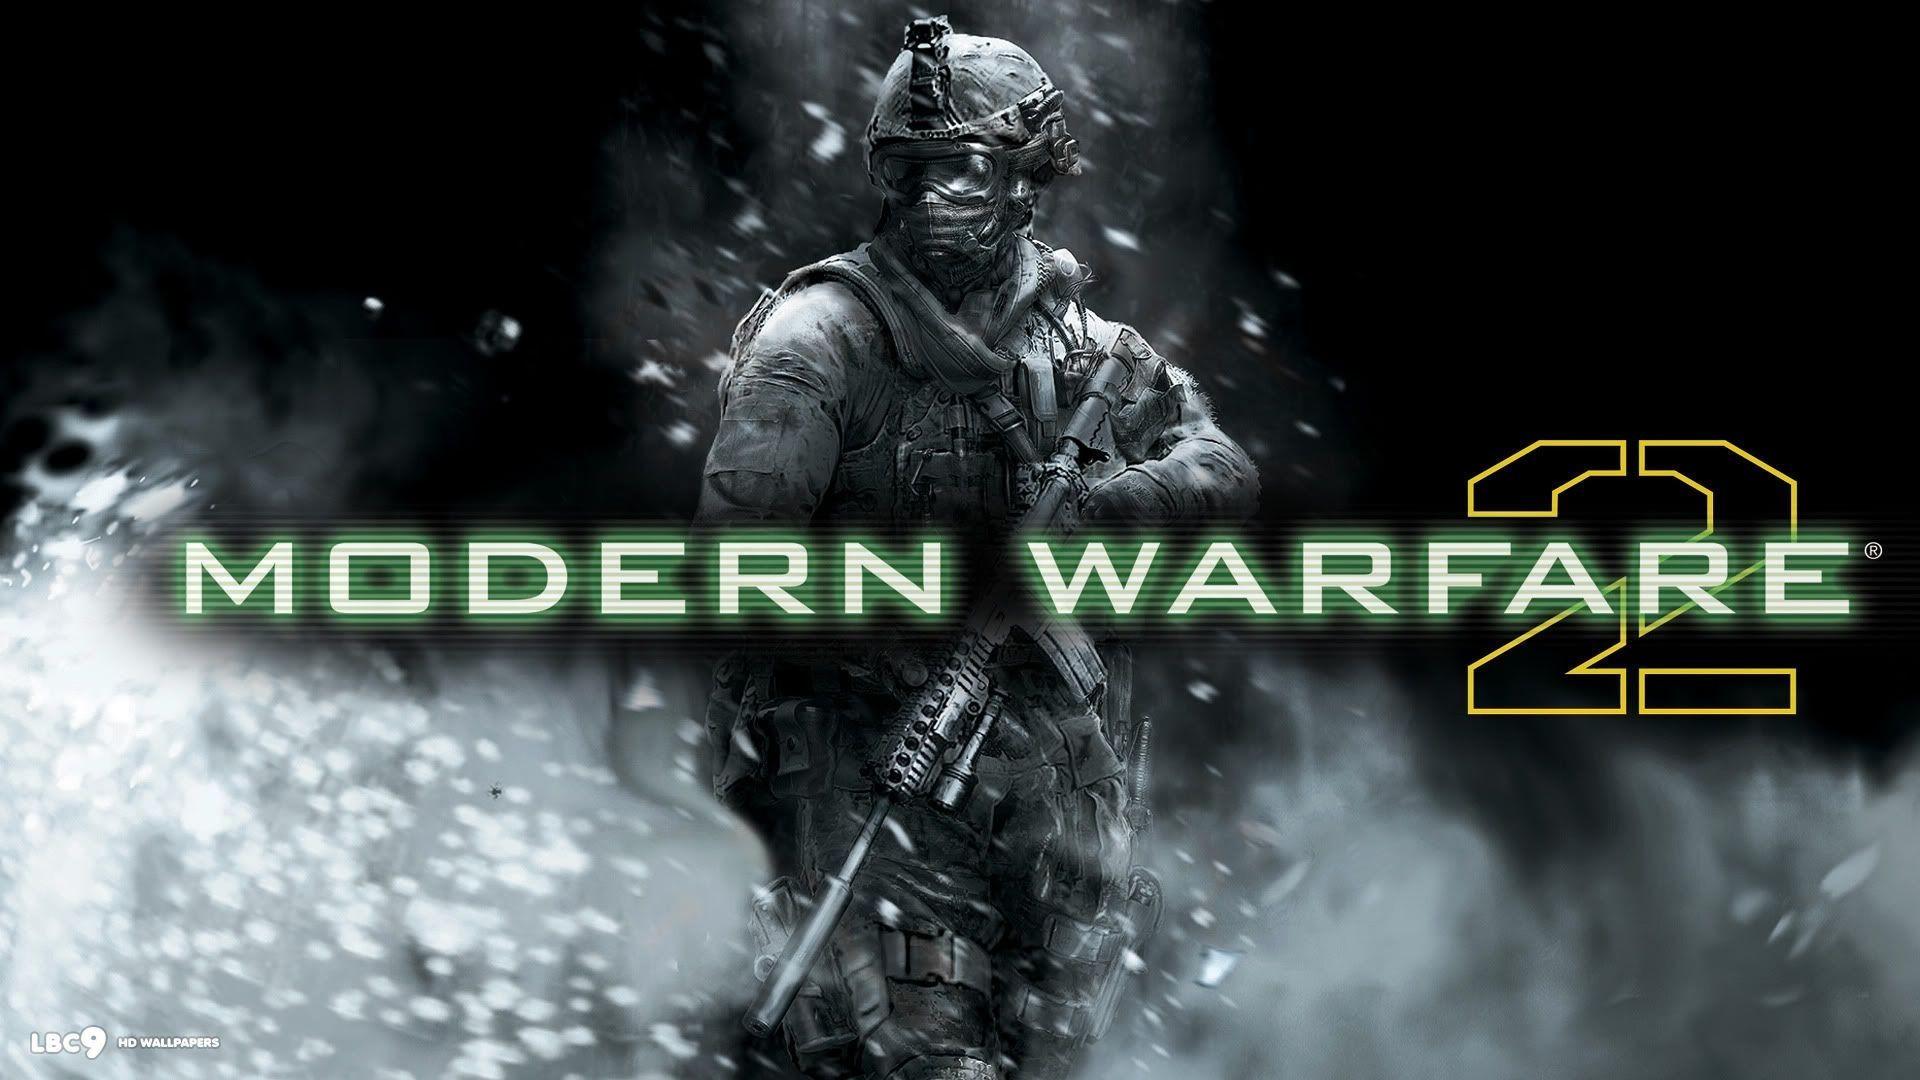 Call of duty modern warfare 2 wallpapers wallpapertag - Call of duty warfare wallpaper ...